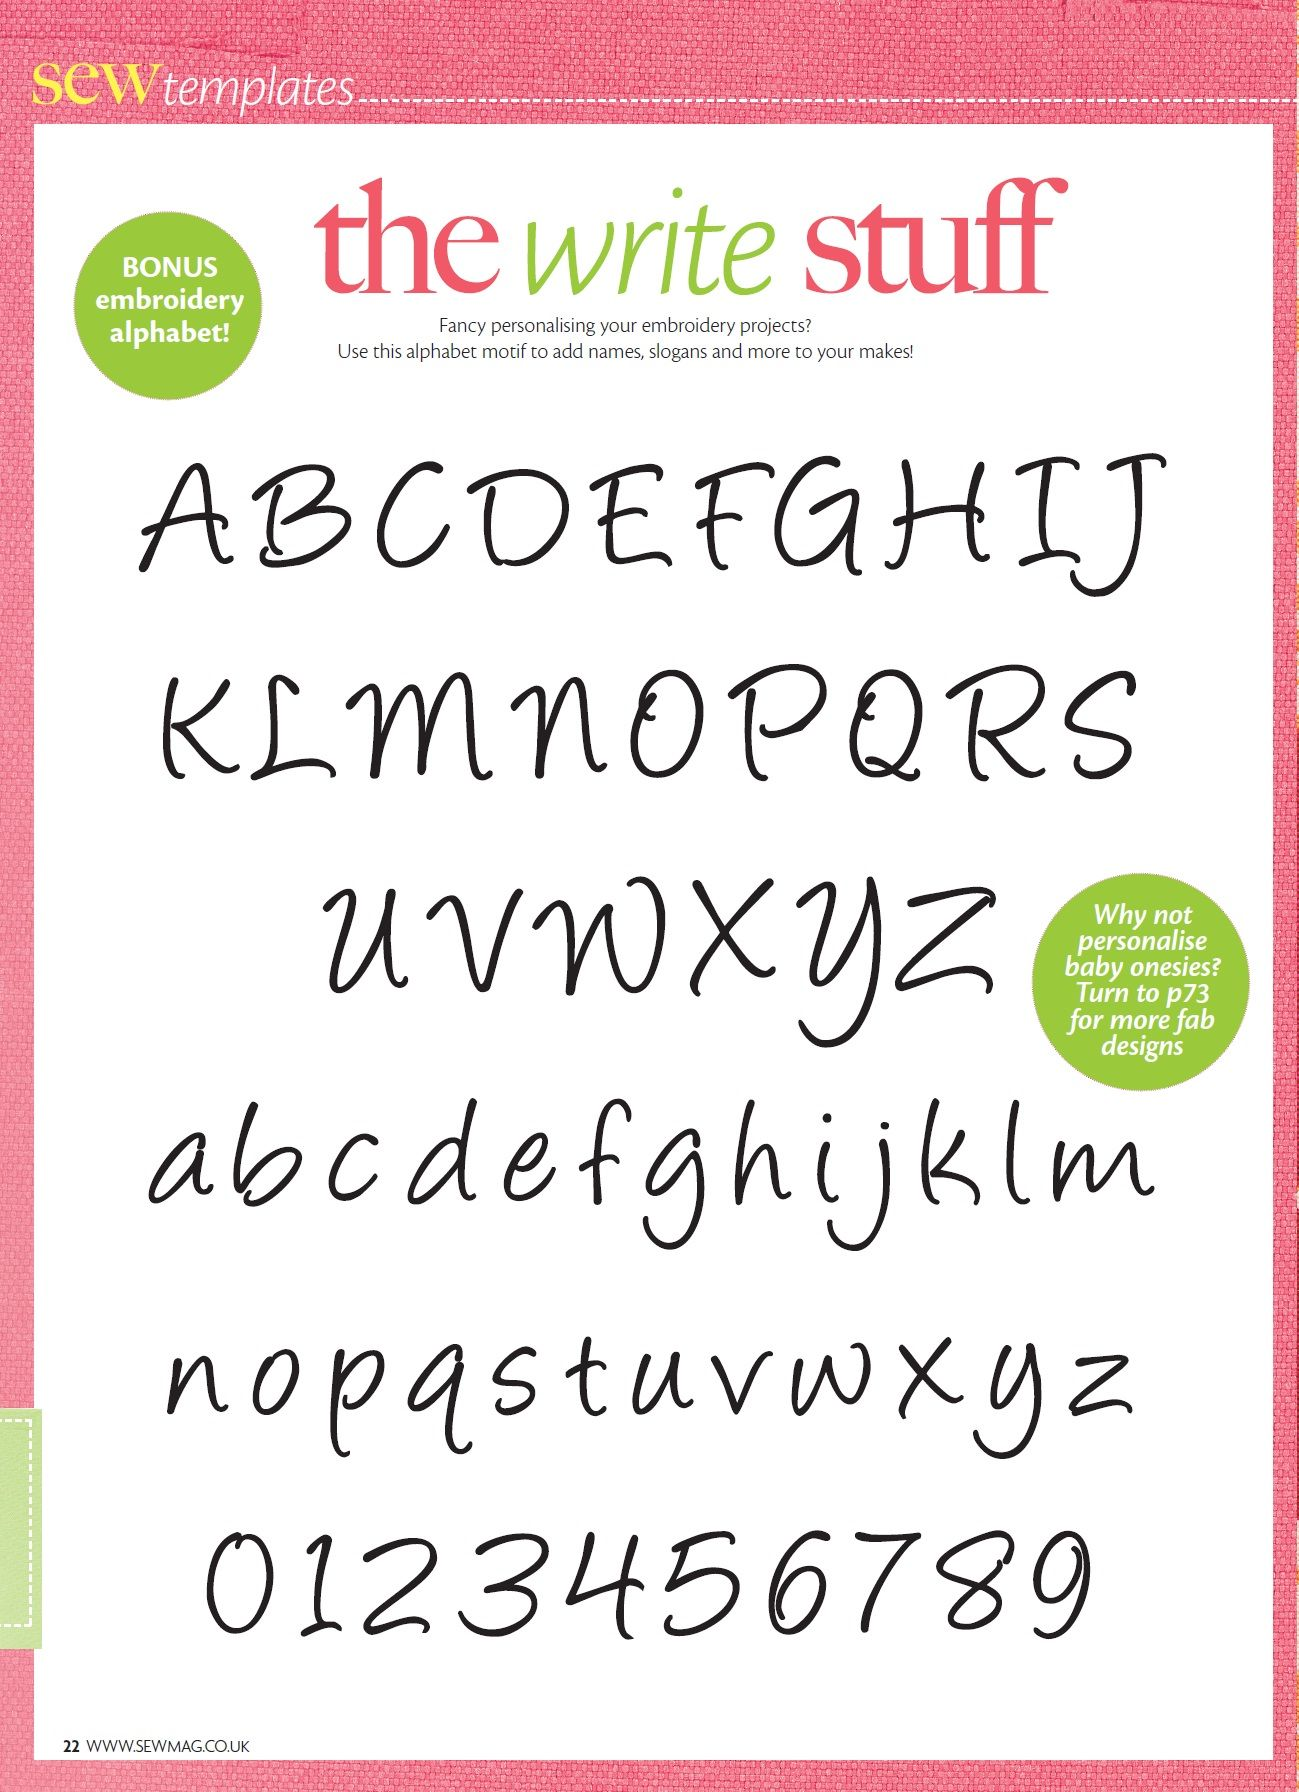 The Write Stuff Embroidery Alphabet Templates Pinterest